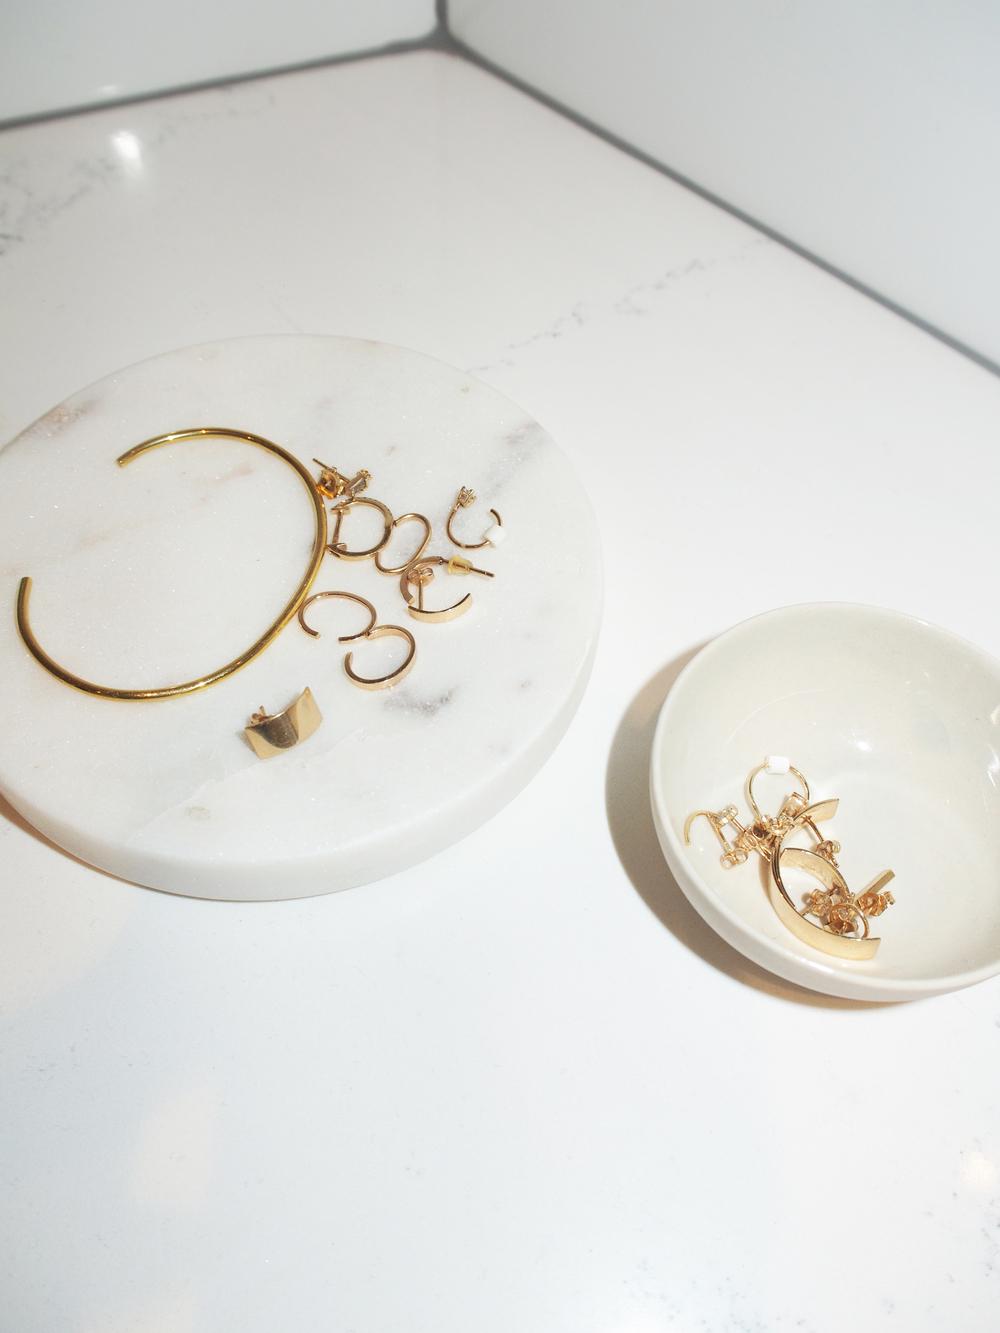 AGJ Archive Jewelry Sale Taylr Anne's Favorites www.taylranne.com